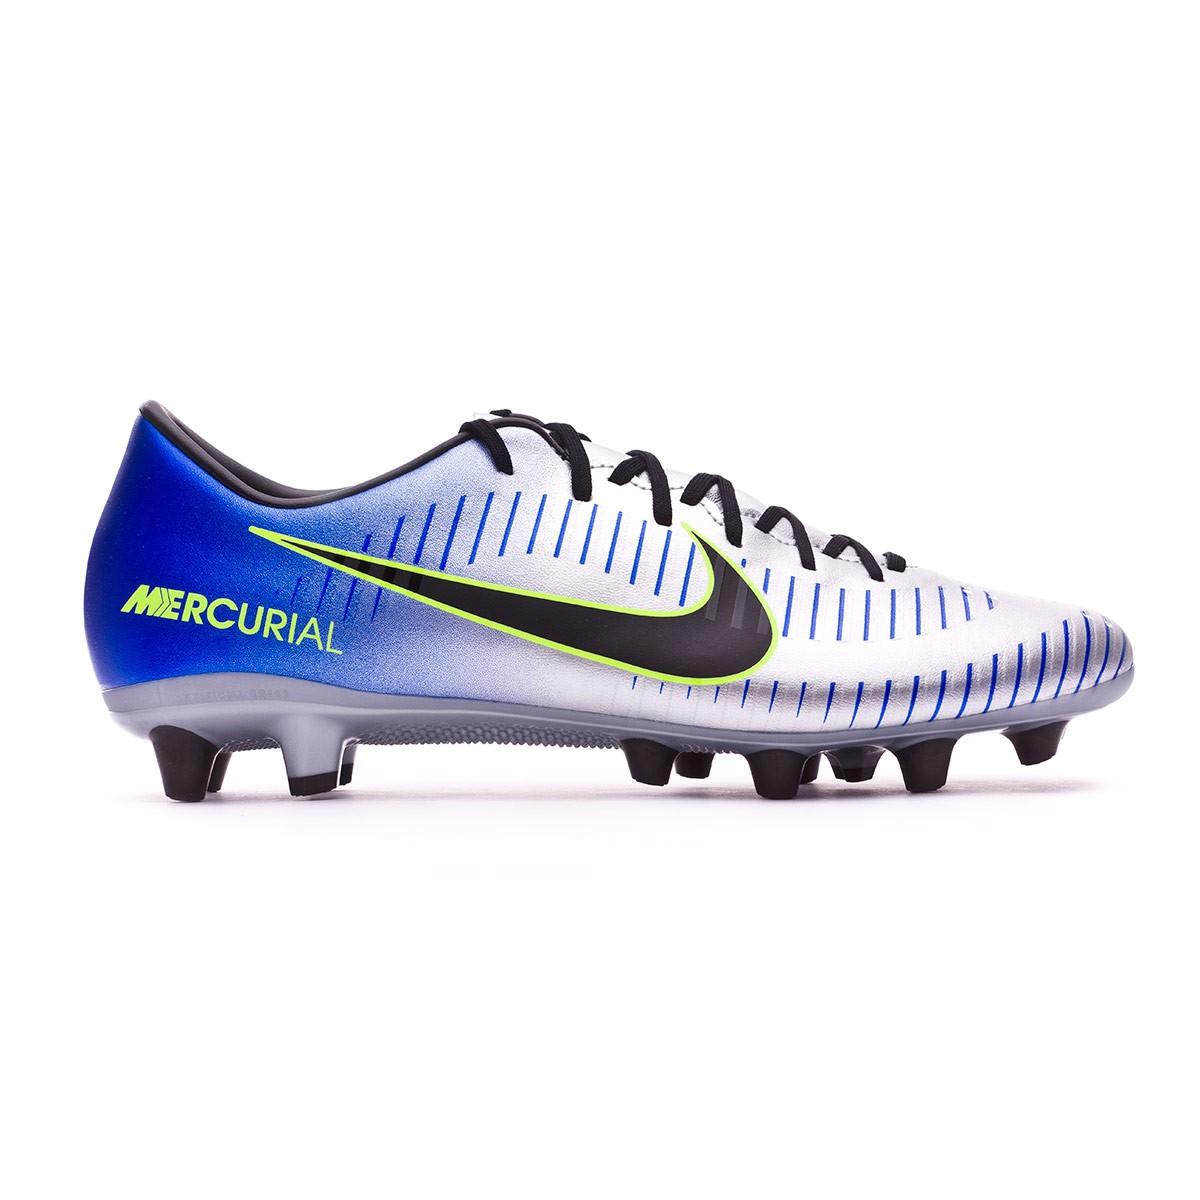 3dff176e6 Football Boots Nike Mercurial Victory VI AG Neymar Racer blue-Black-Chrome-Volt  - Football store Fútbol Emotion